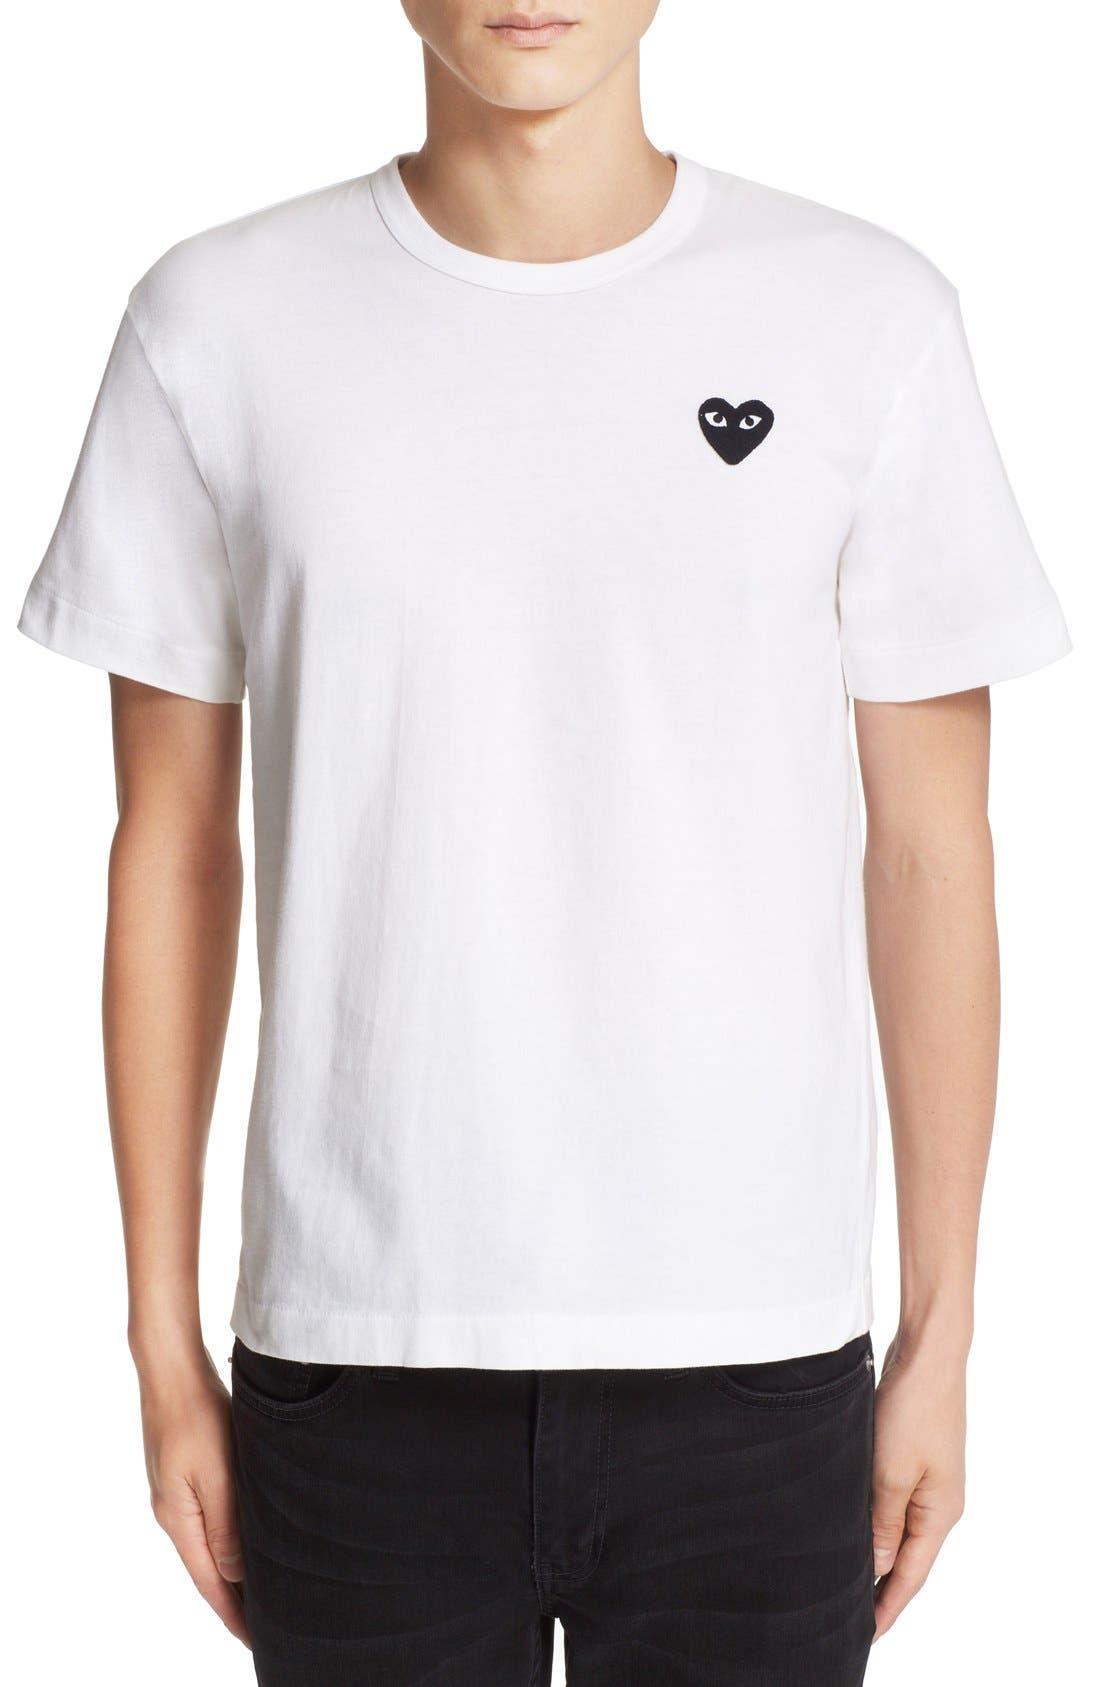 converse play t shirt